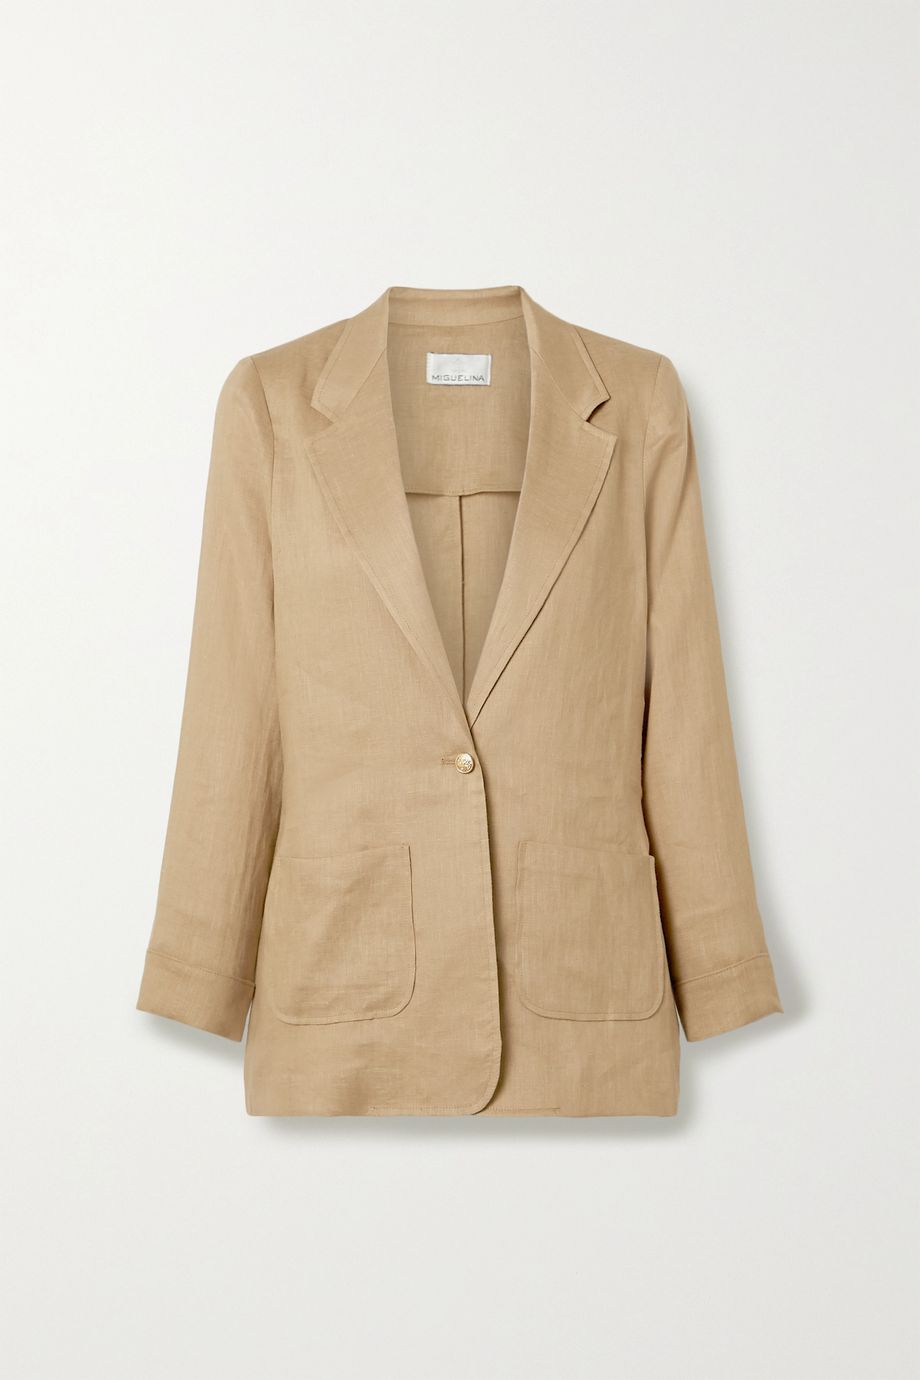 Miguelina Bleecker linen blazer